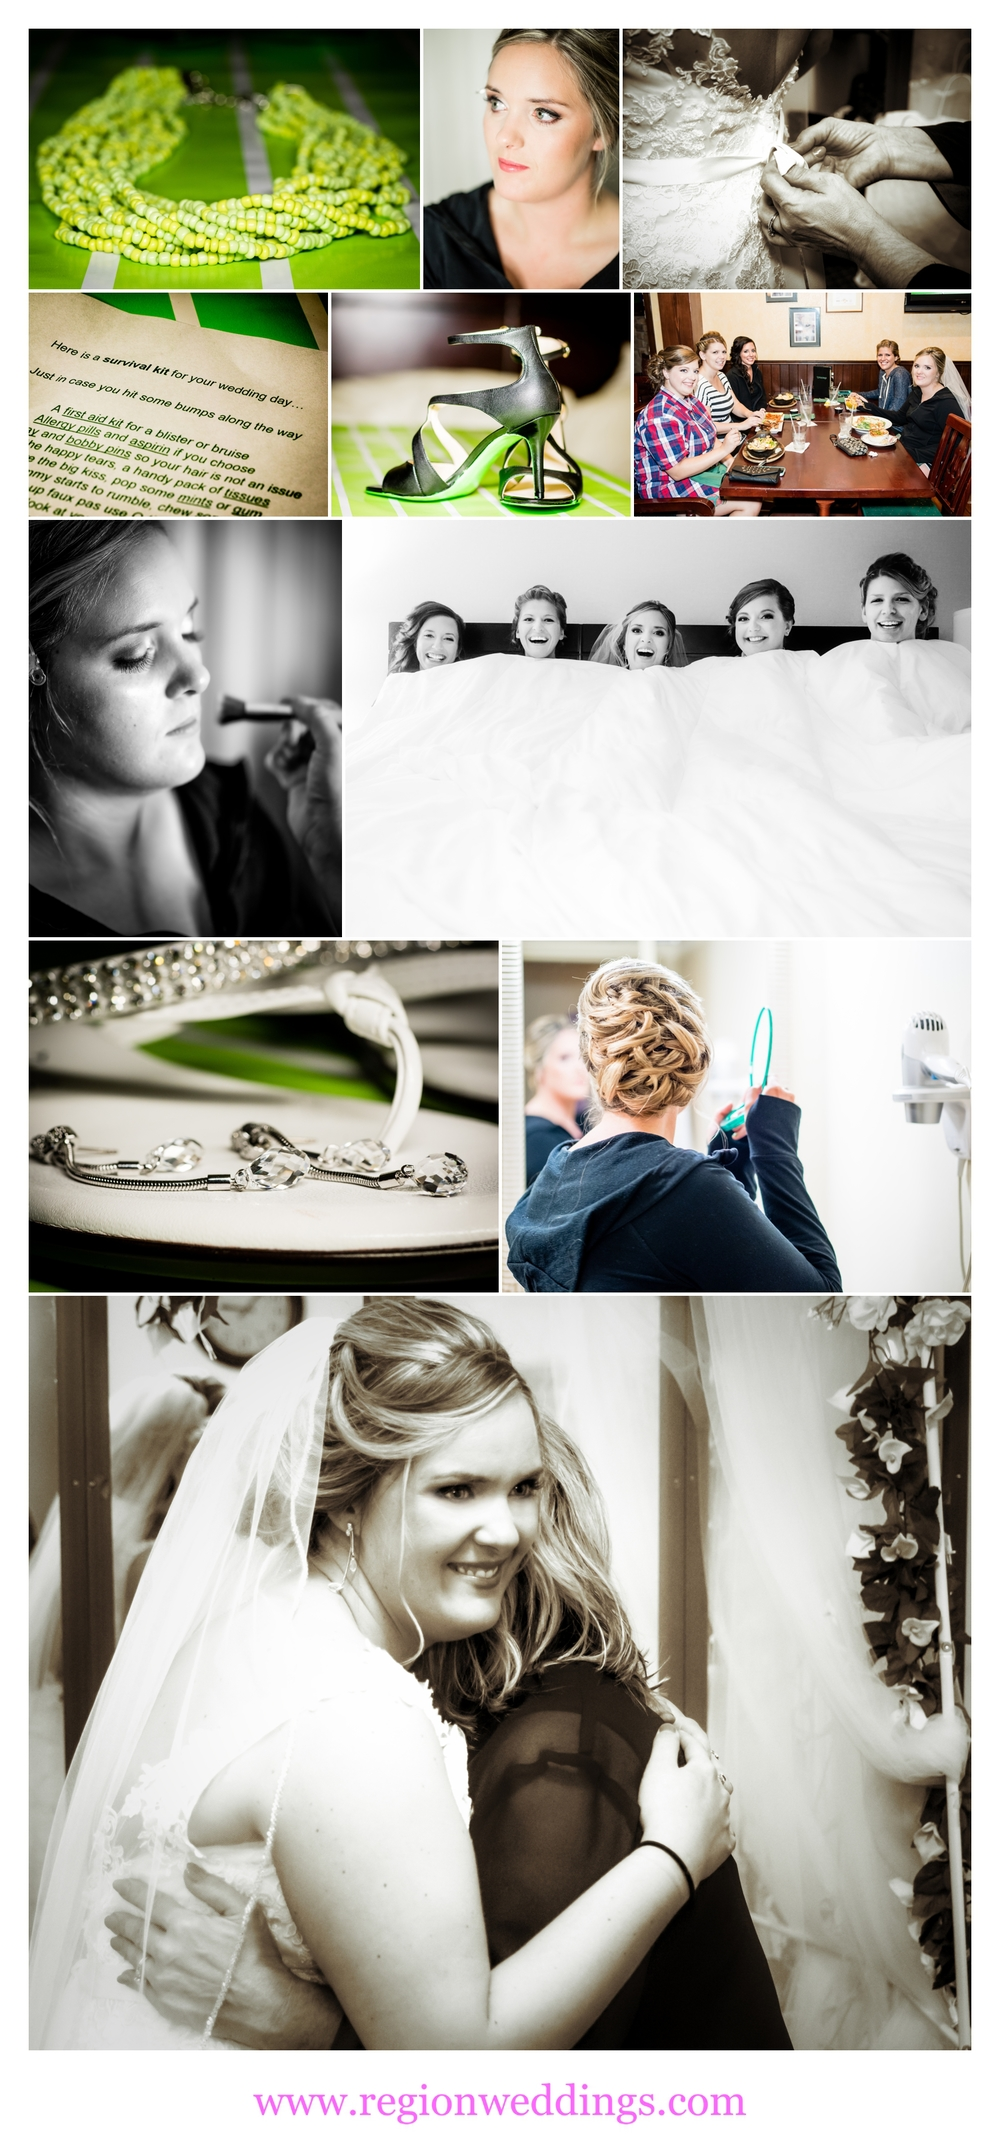 Bridal prep at Radisson Hotel.